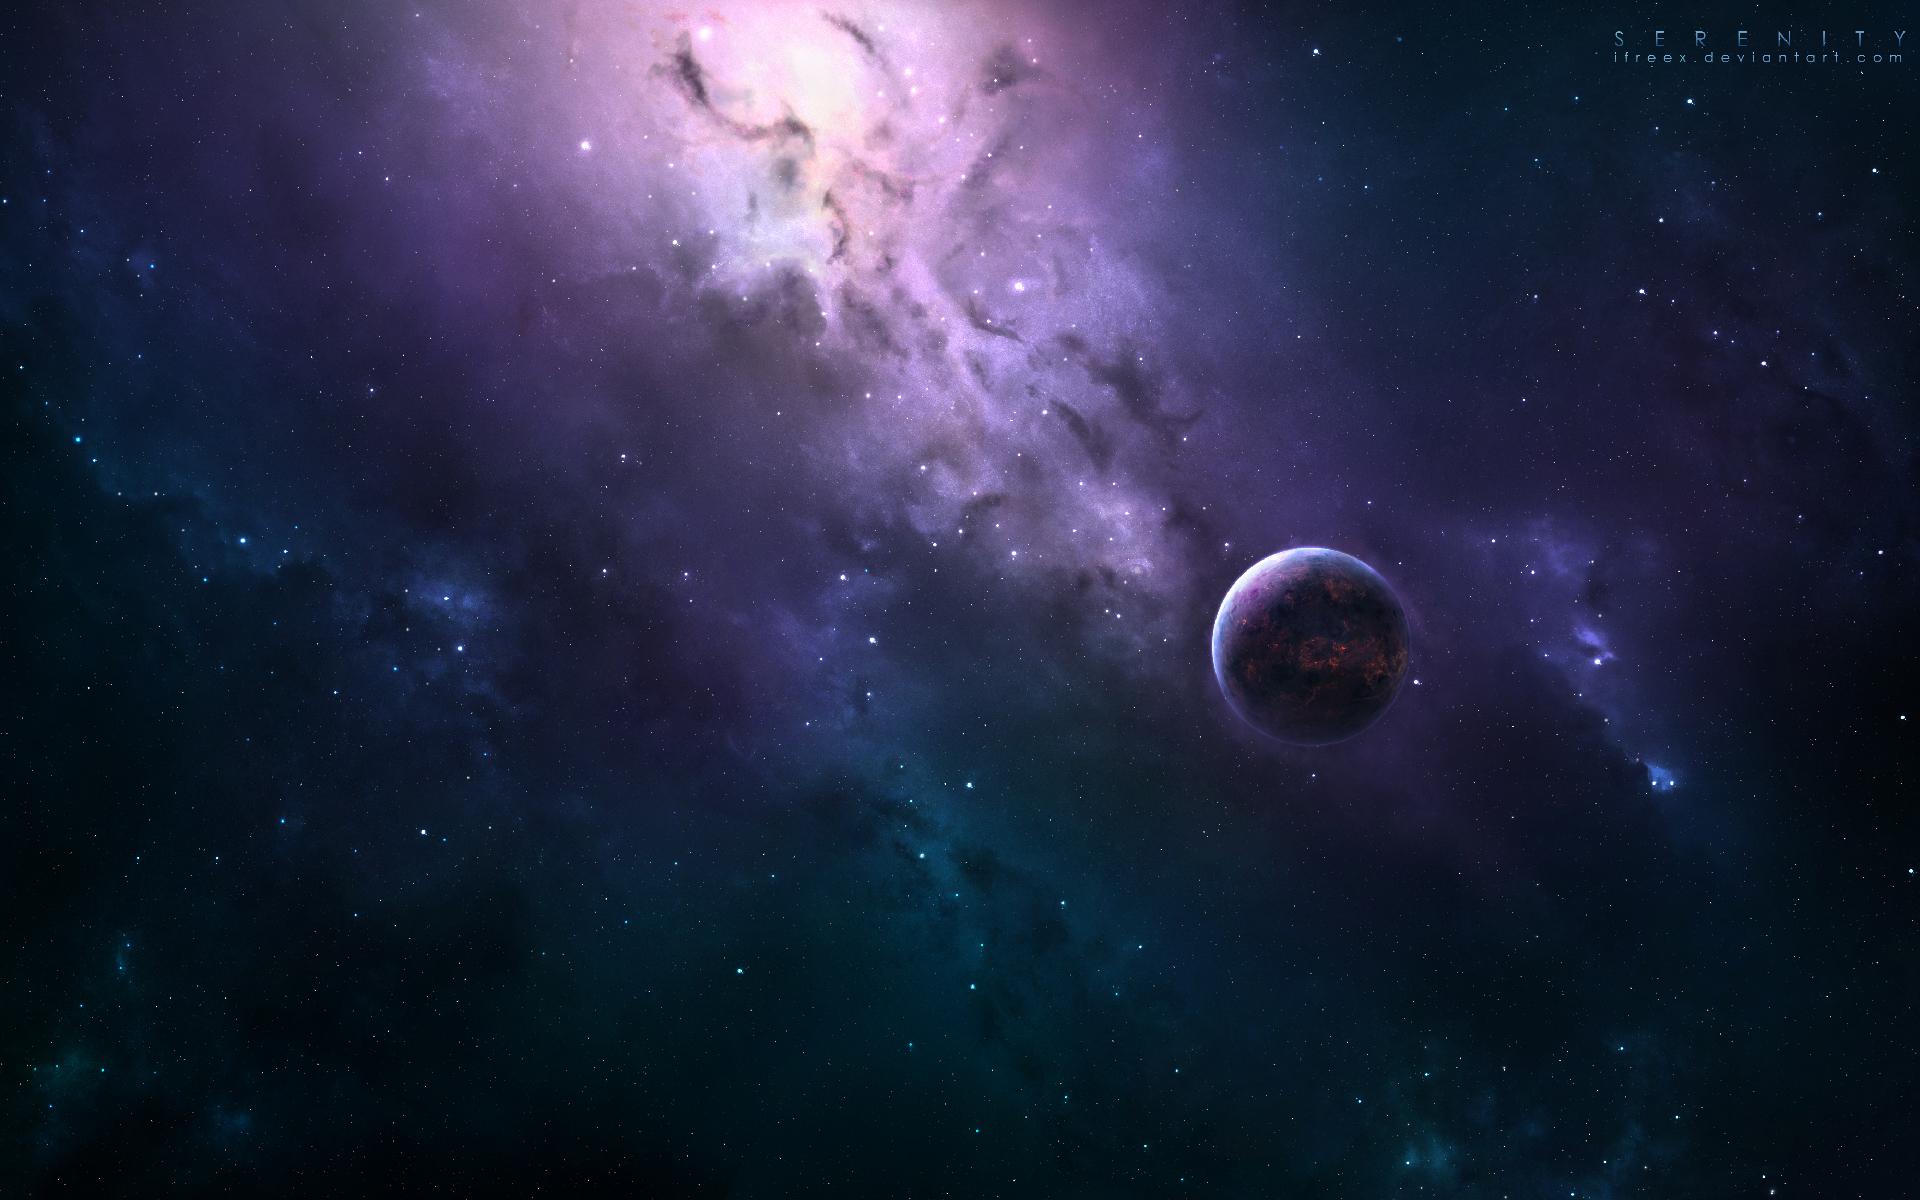 Digital Universe Galaxy Hd Digital Universe 4k